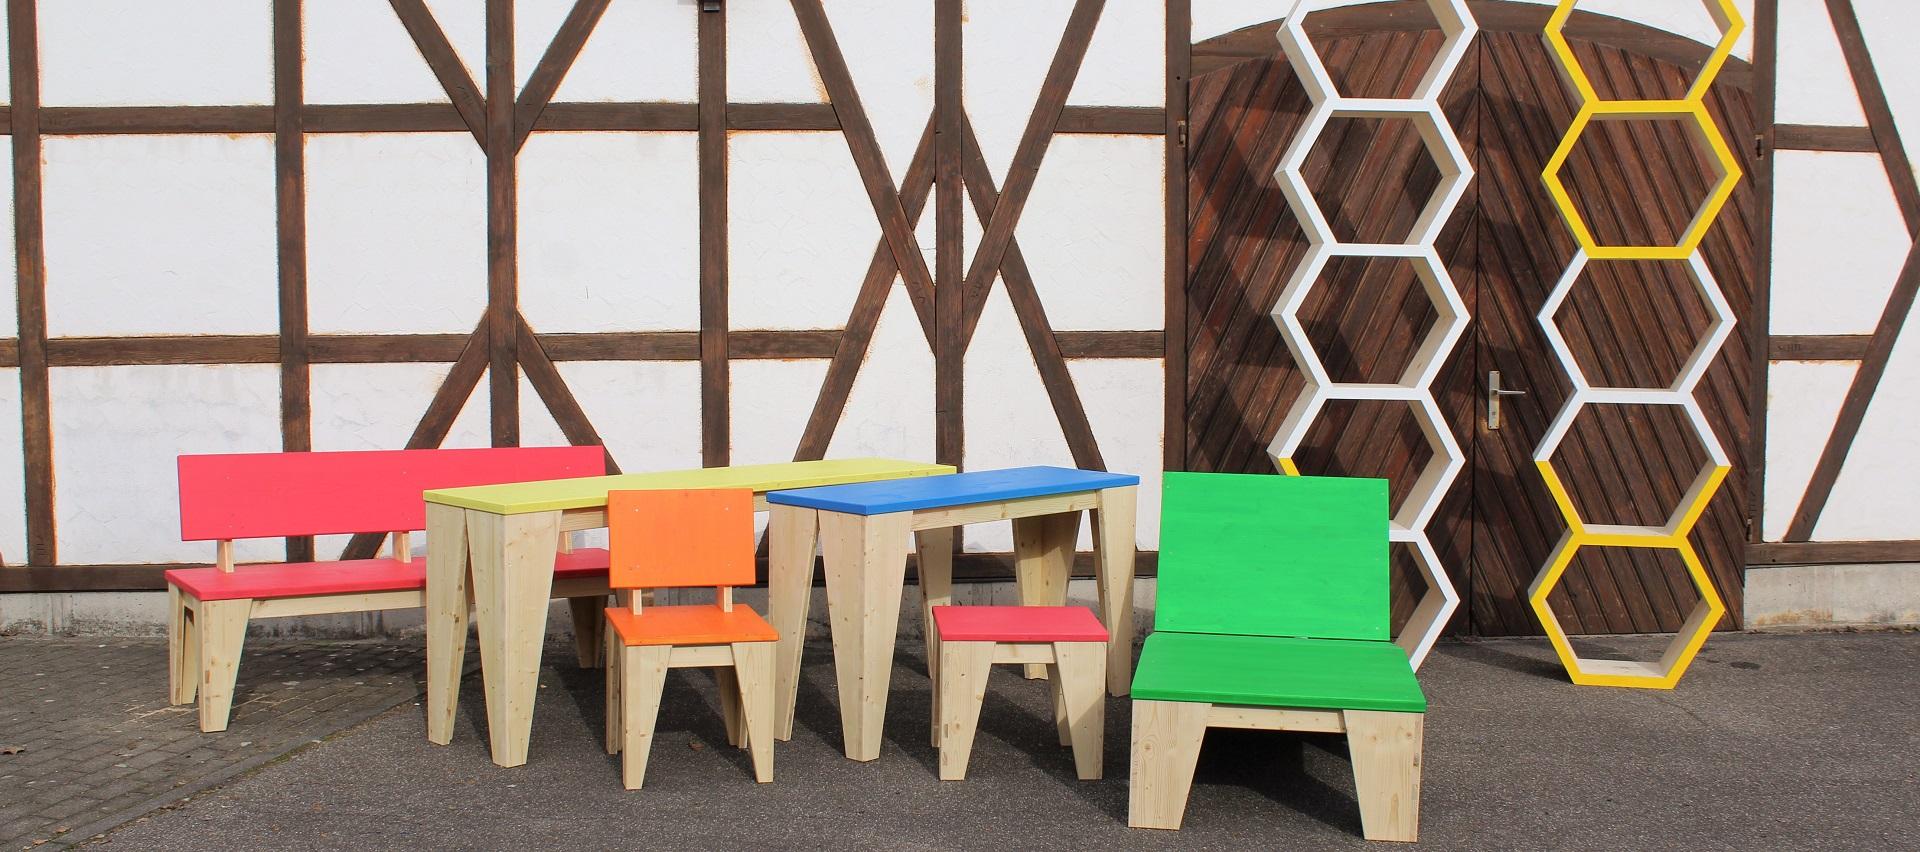 DIY Buga Möbel bei Holz-Hauff GmbH in Leingarten